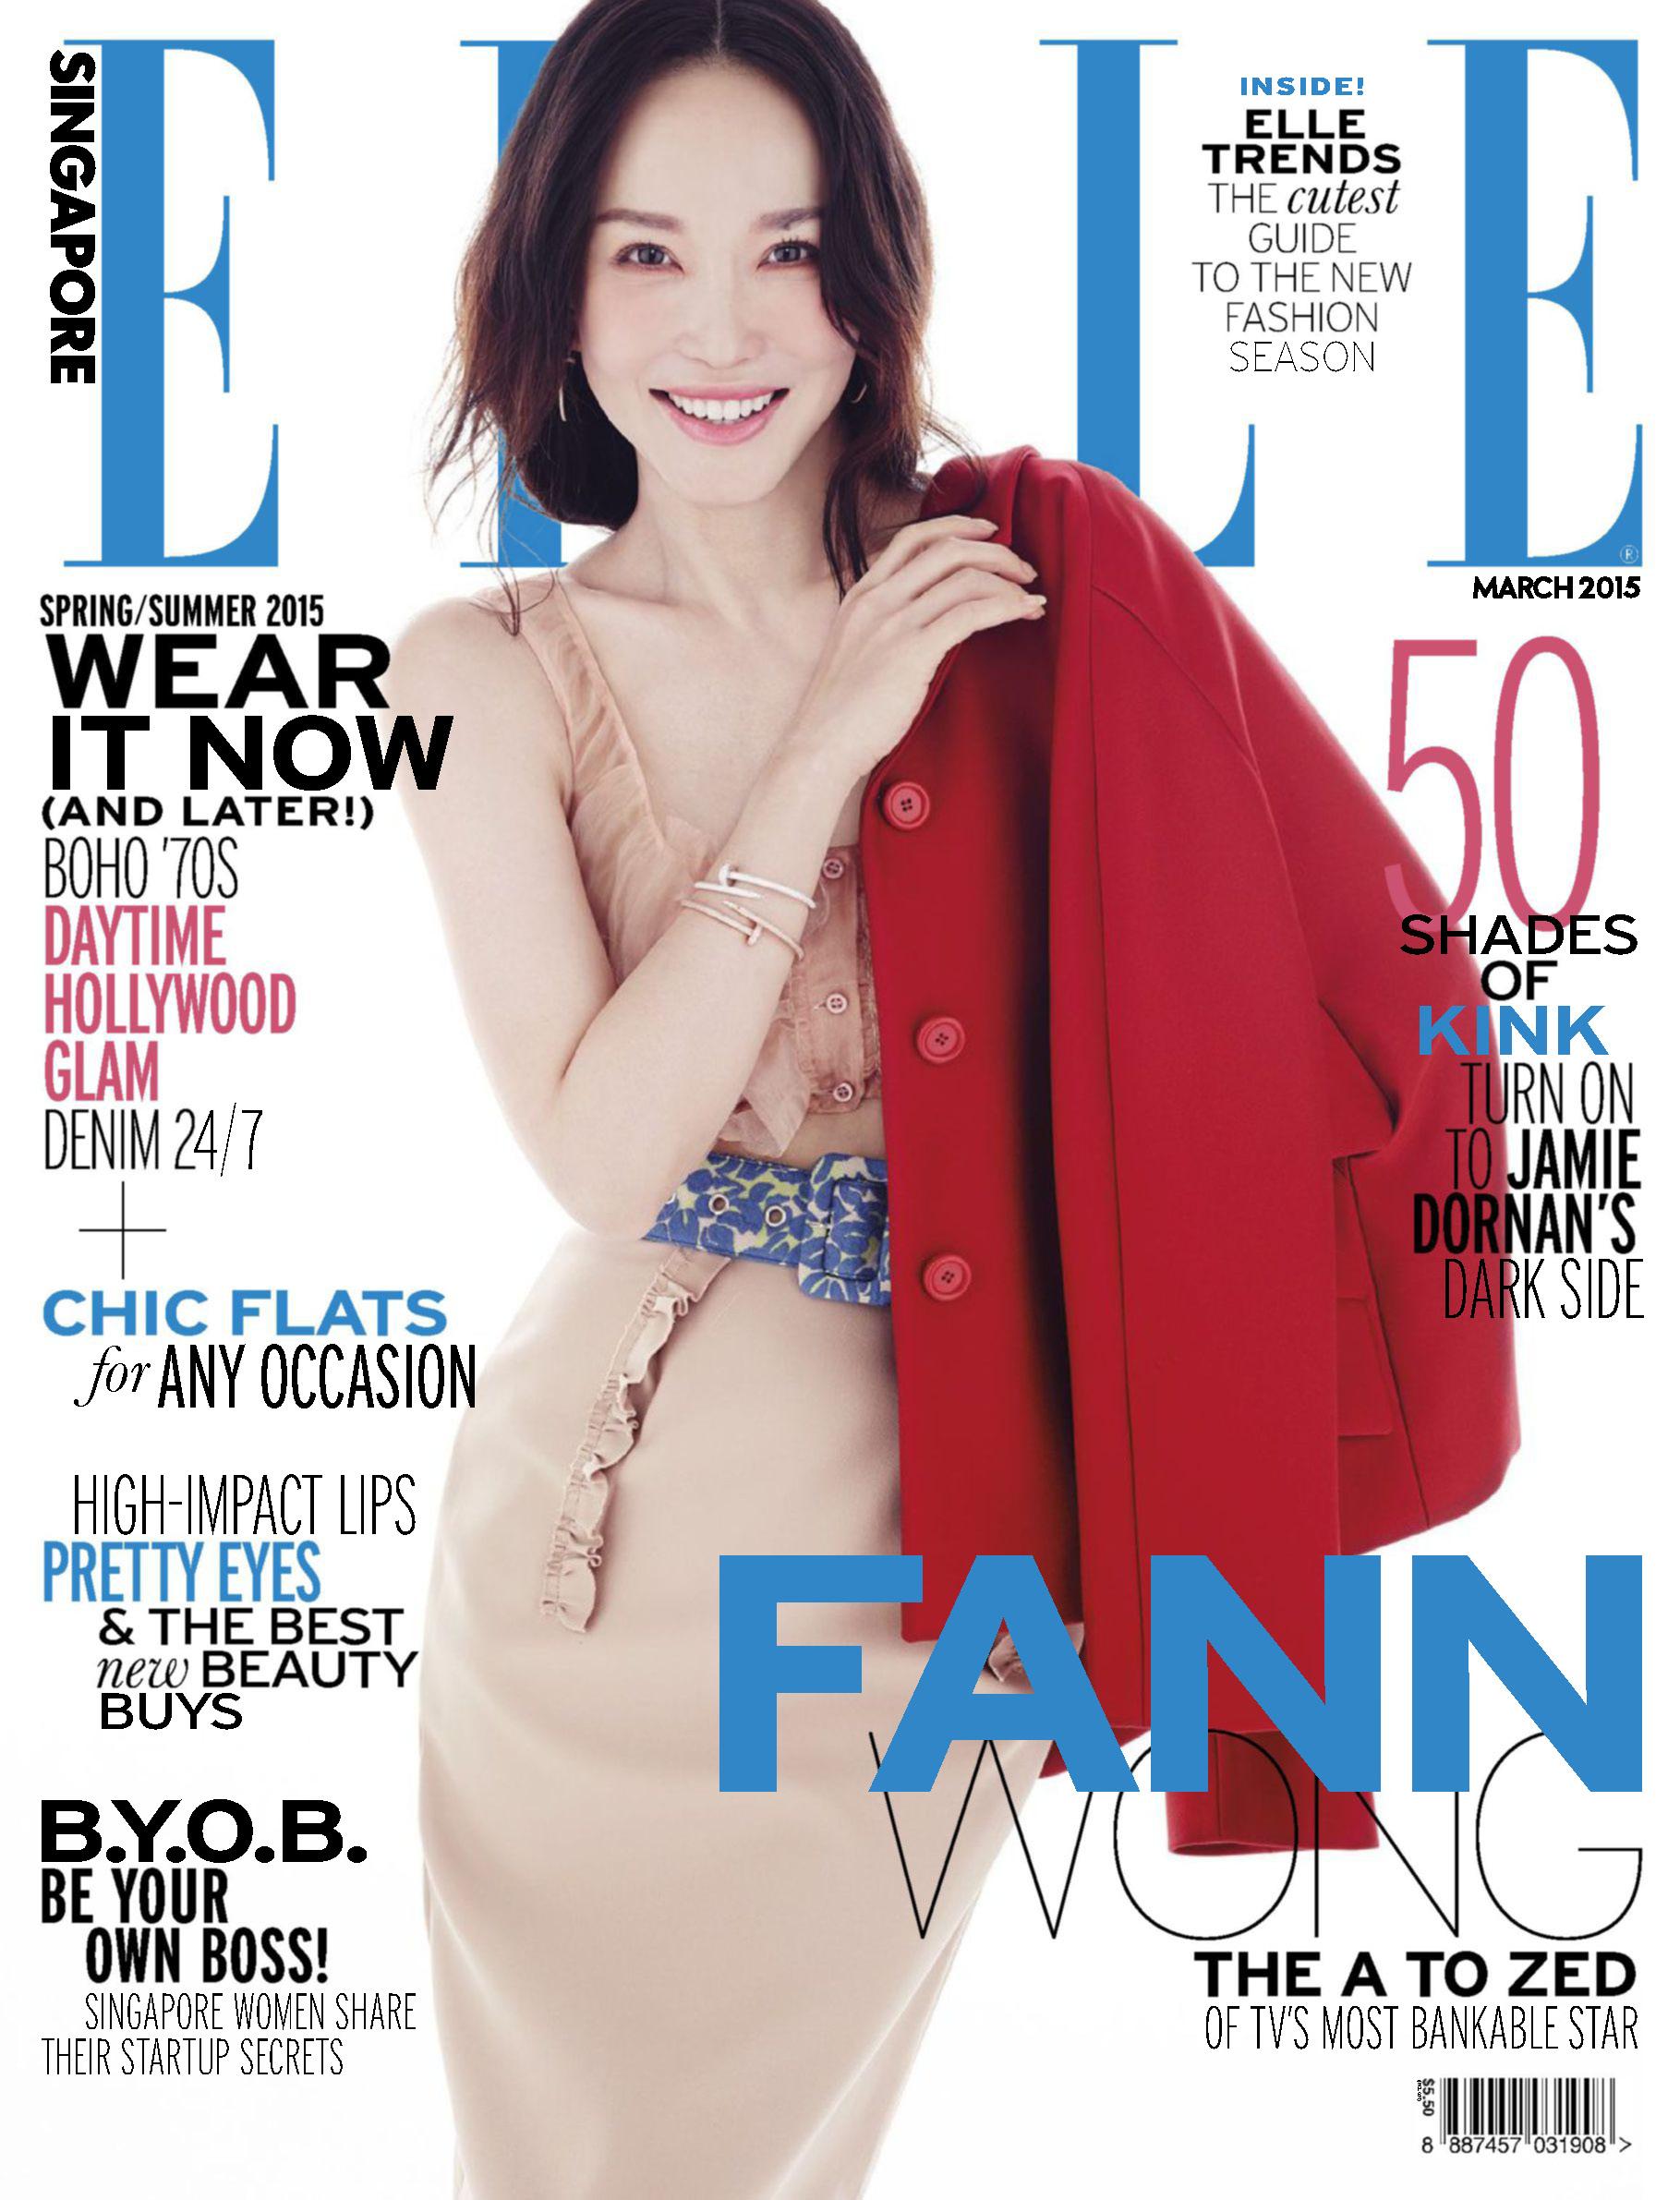 Fashion magazine in singapore 40